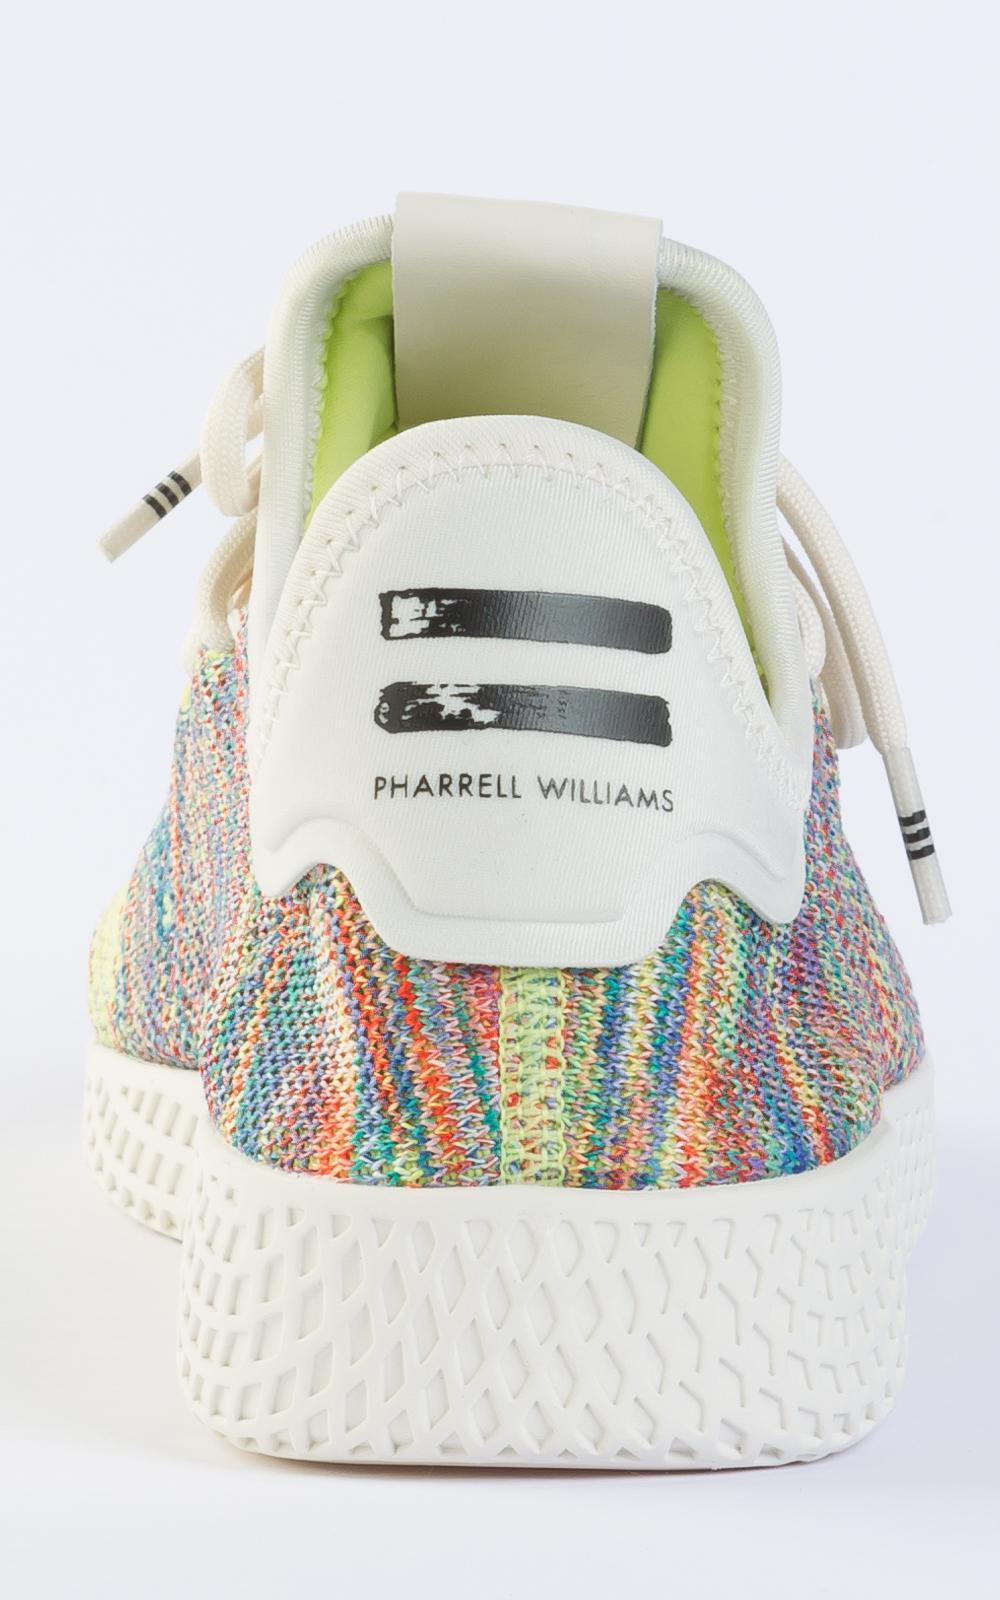 adidas Originals Rubber Adidas X Pharell Williams Tennis Hu Sneakers